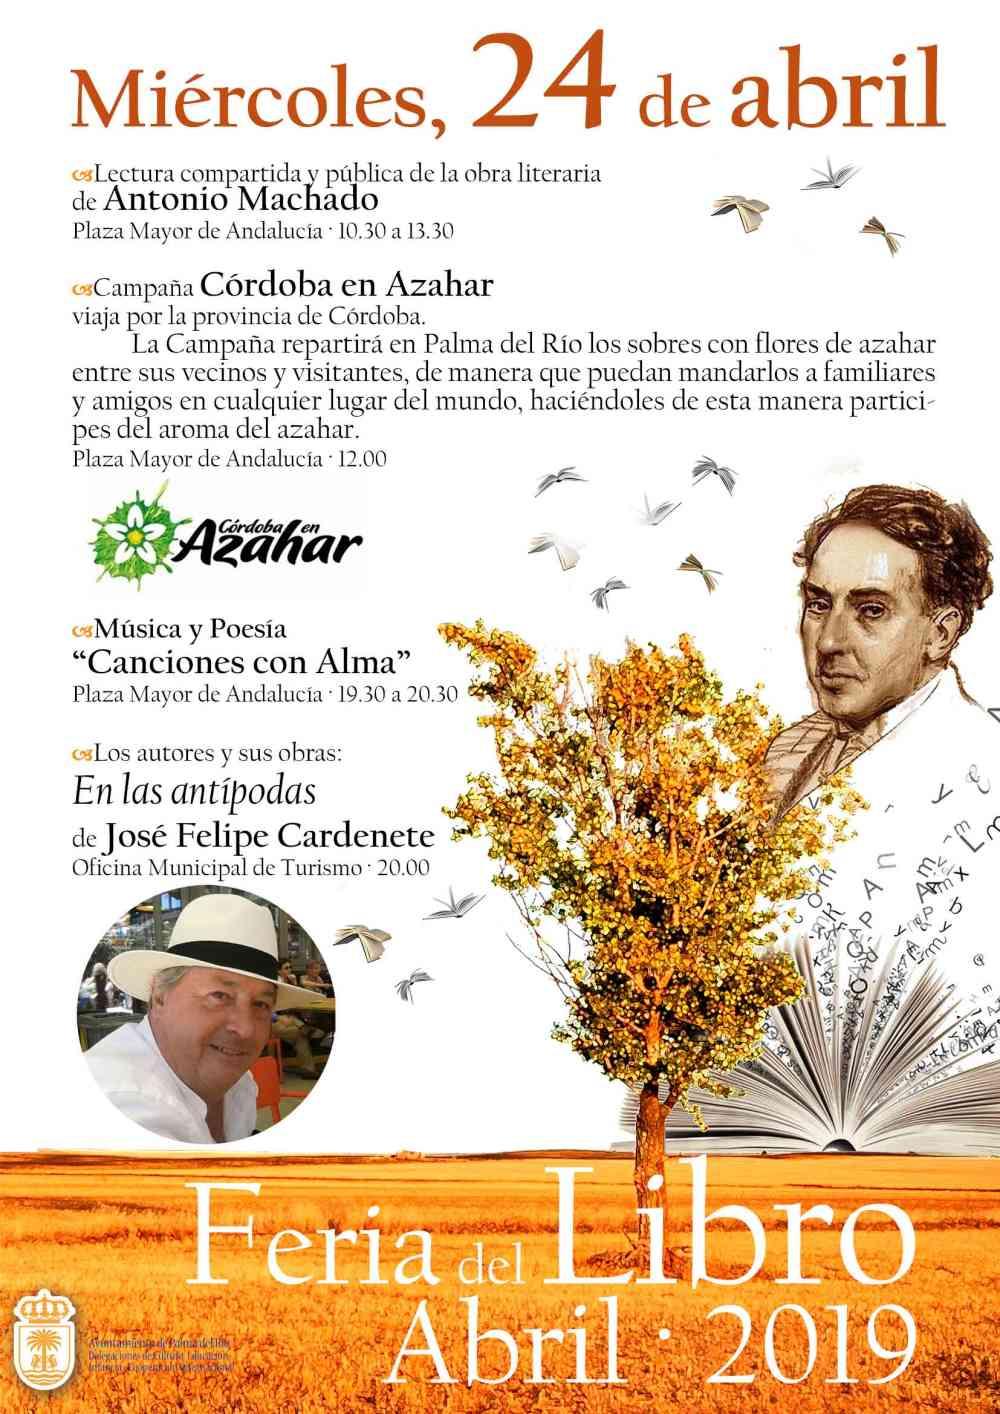 https://www.palmadelrio.es/sites/default/files/web24-feria-libro-miercoles.jpg